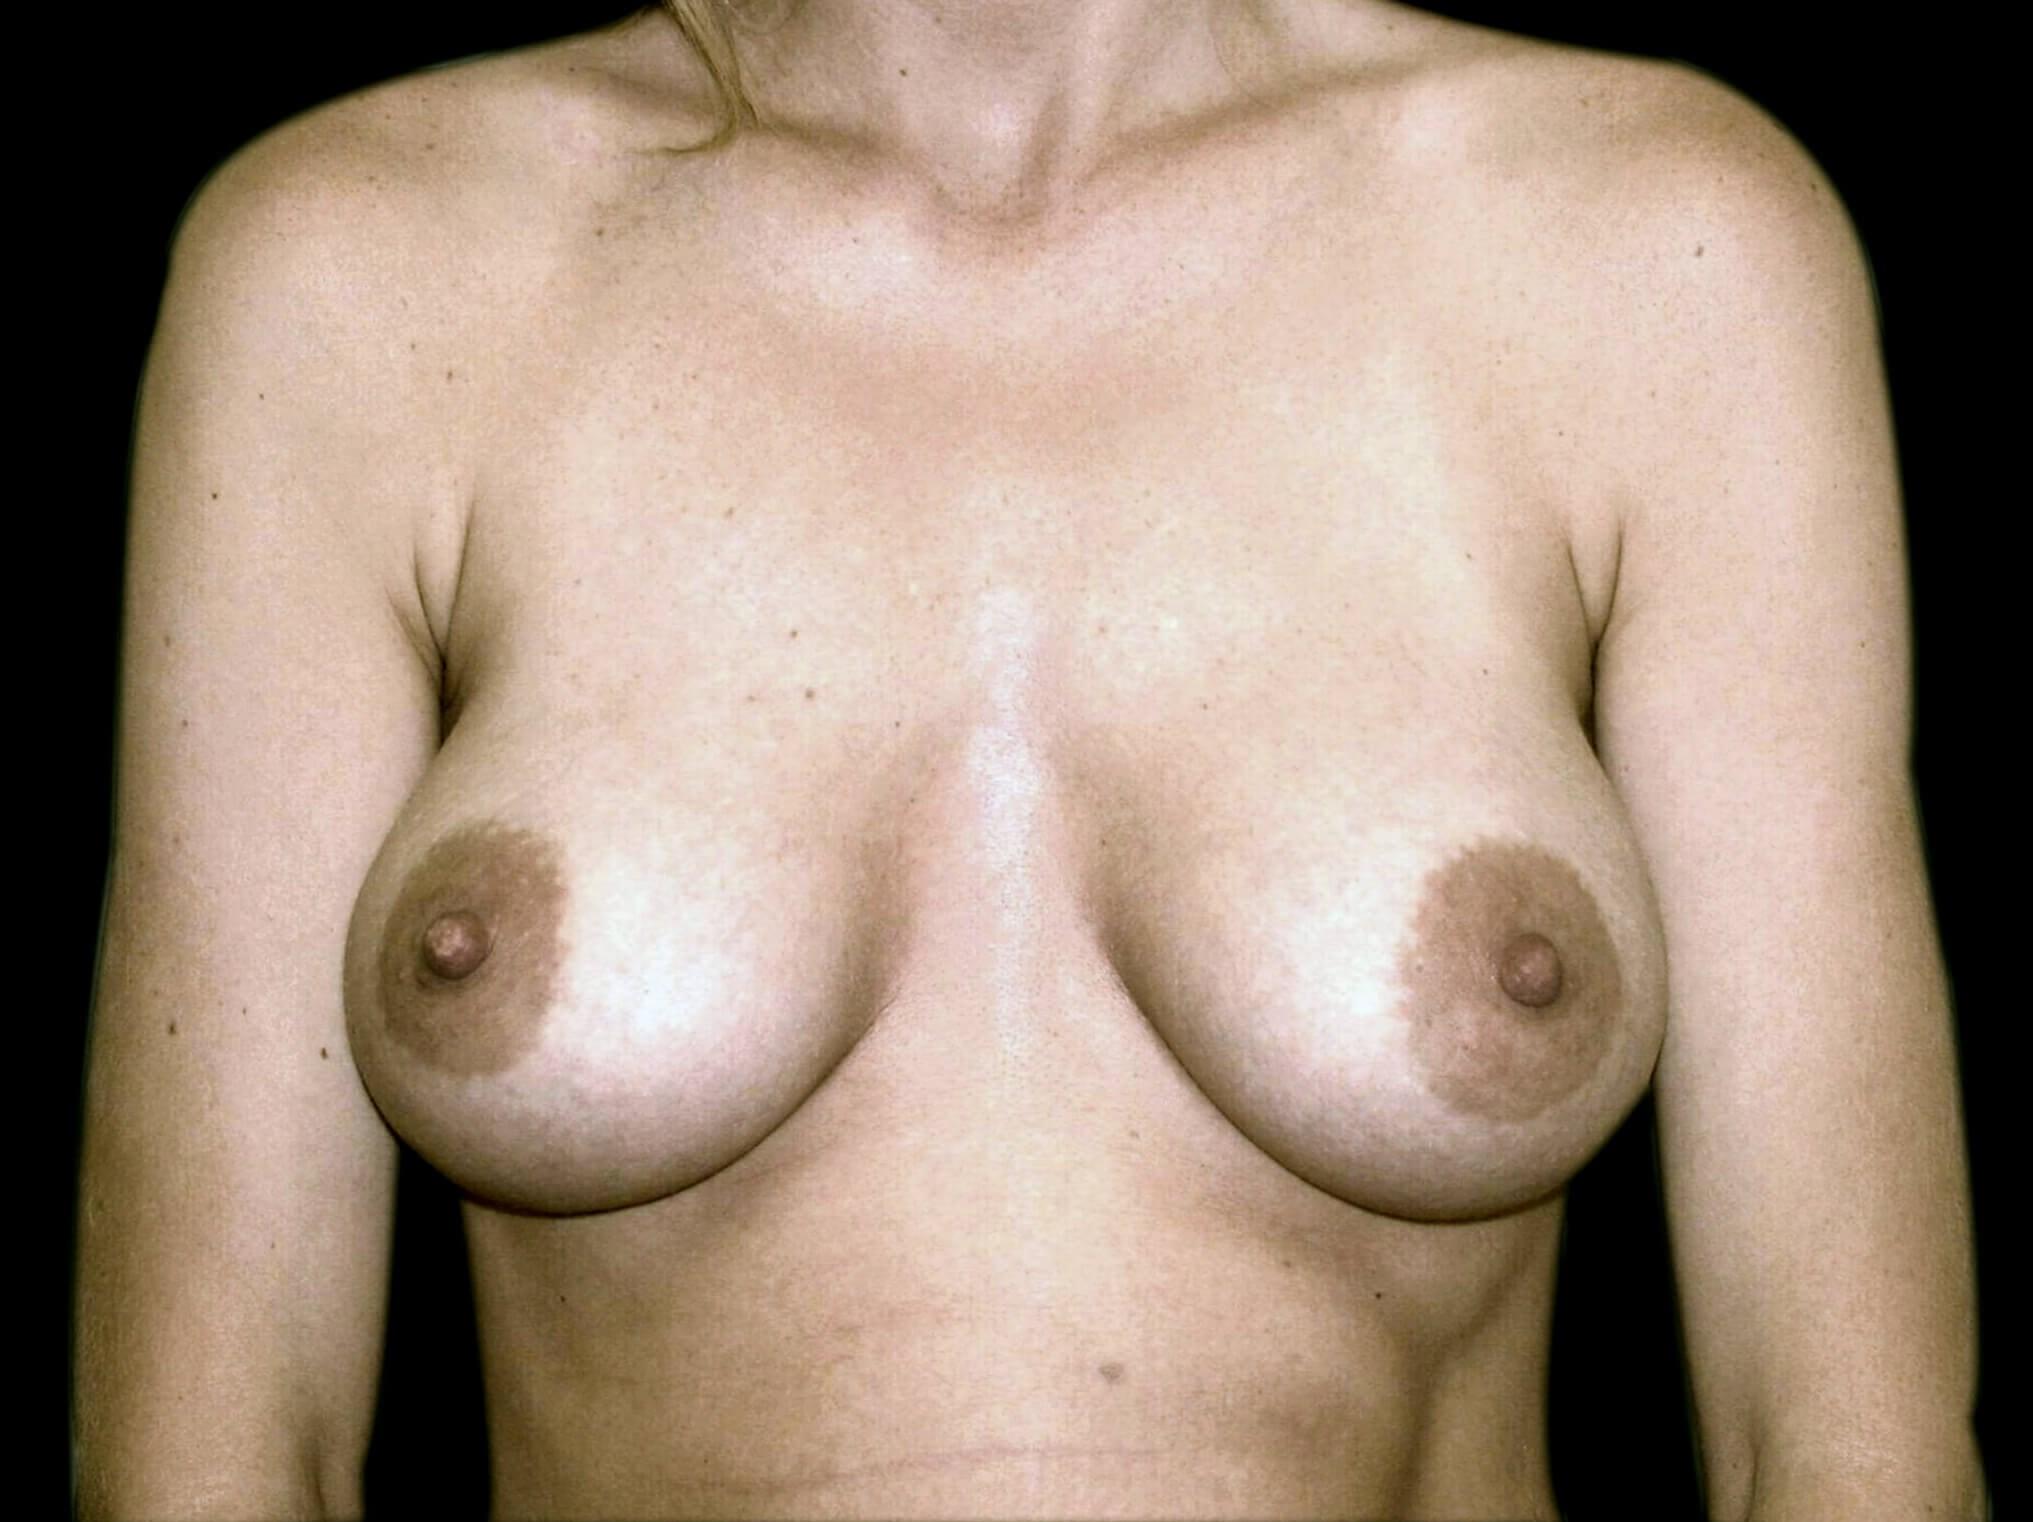 DALLAS, TEXAS WOMAN HAS BREAST AUGMENTATION WITH SALINE BREAST IMPLANTS